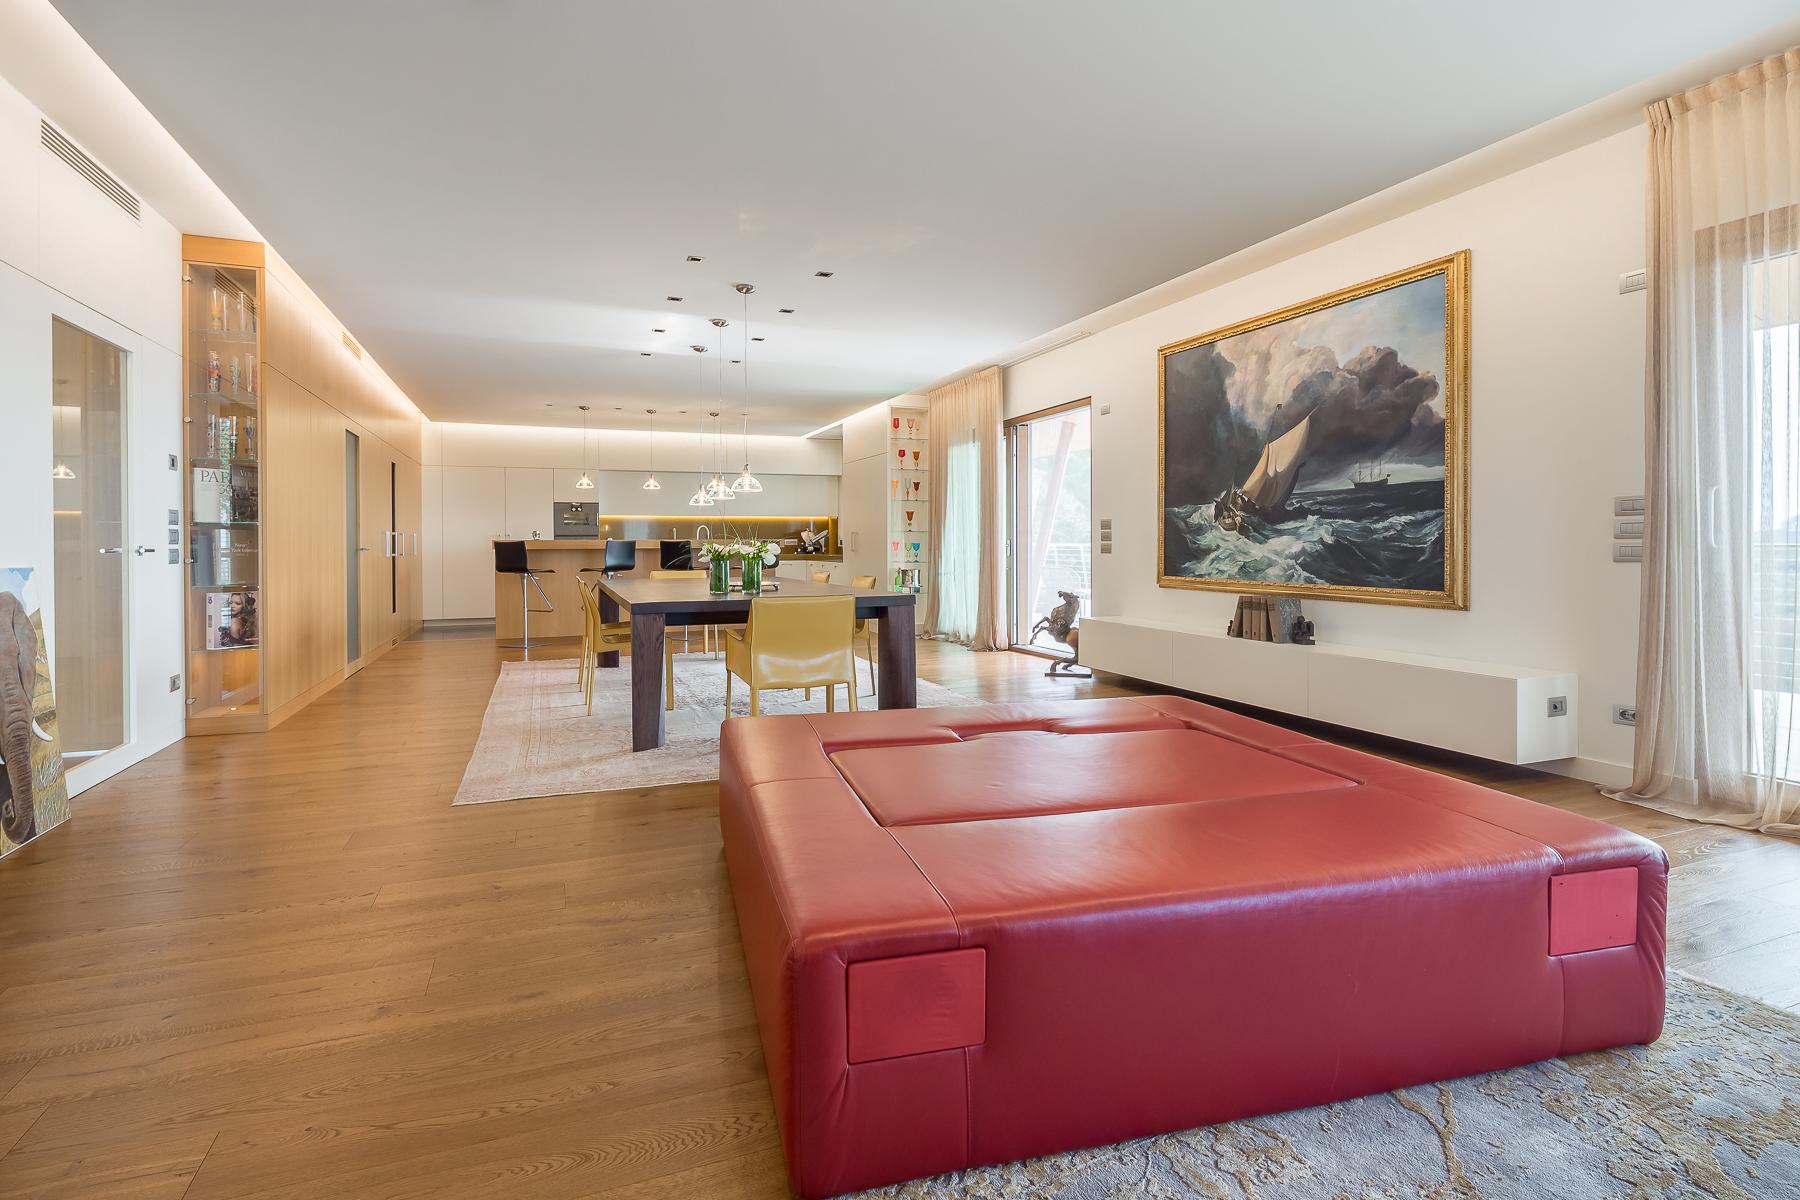 Villa in Vendita a Verona: 5 locali, 630 mq - Foto 28